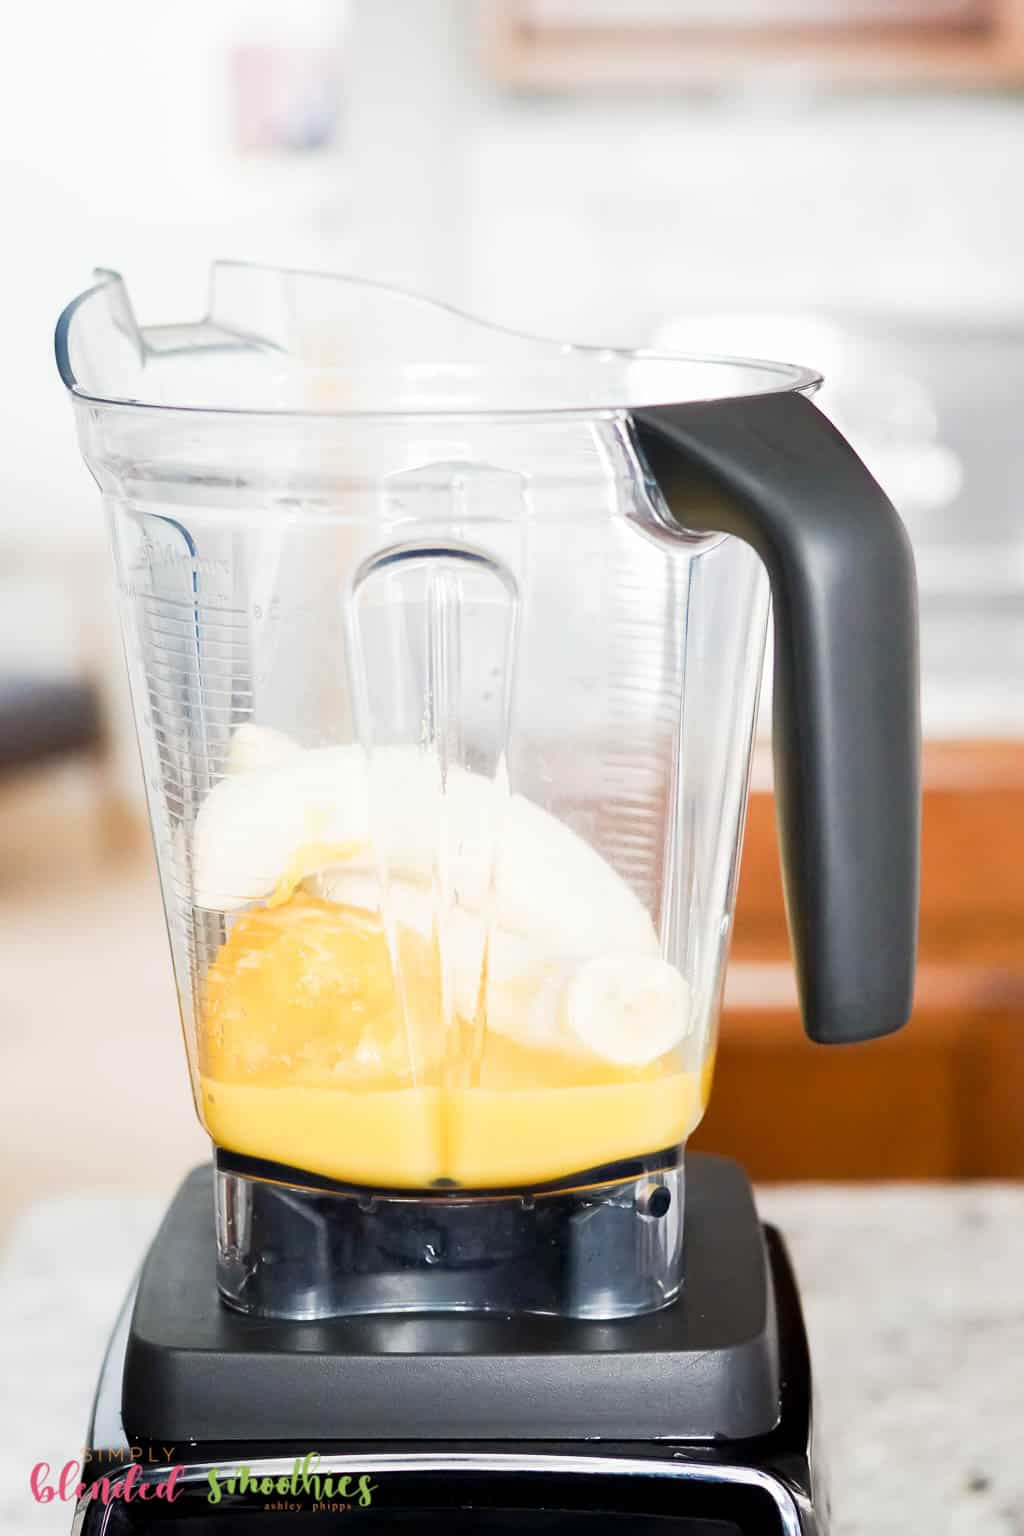 bananas and orange juice in a blender